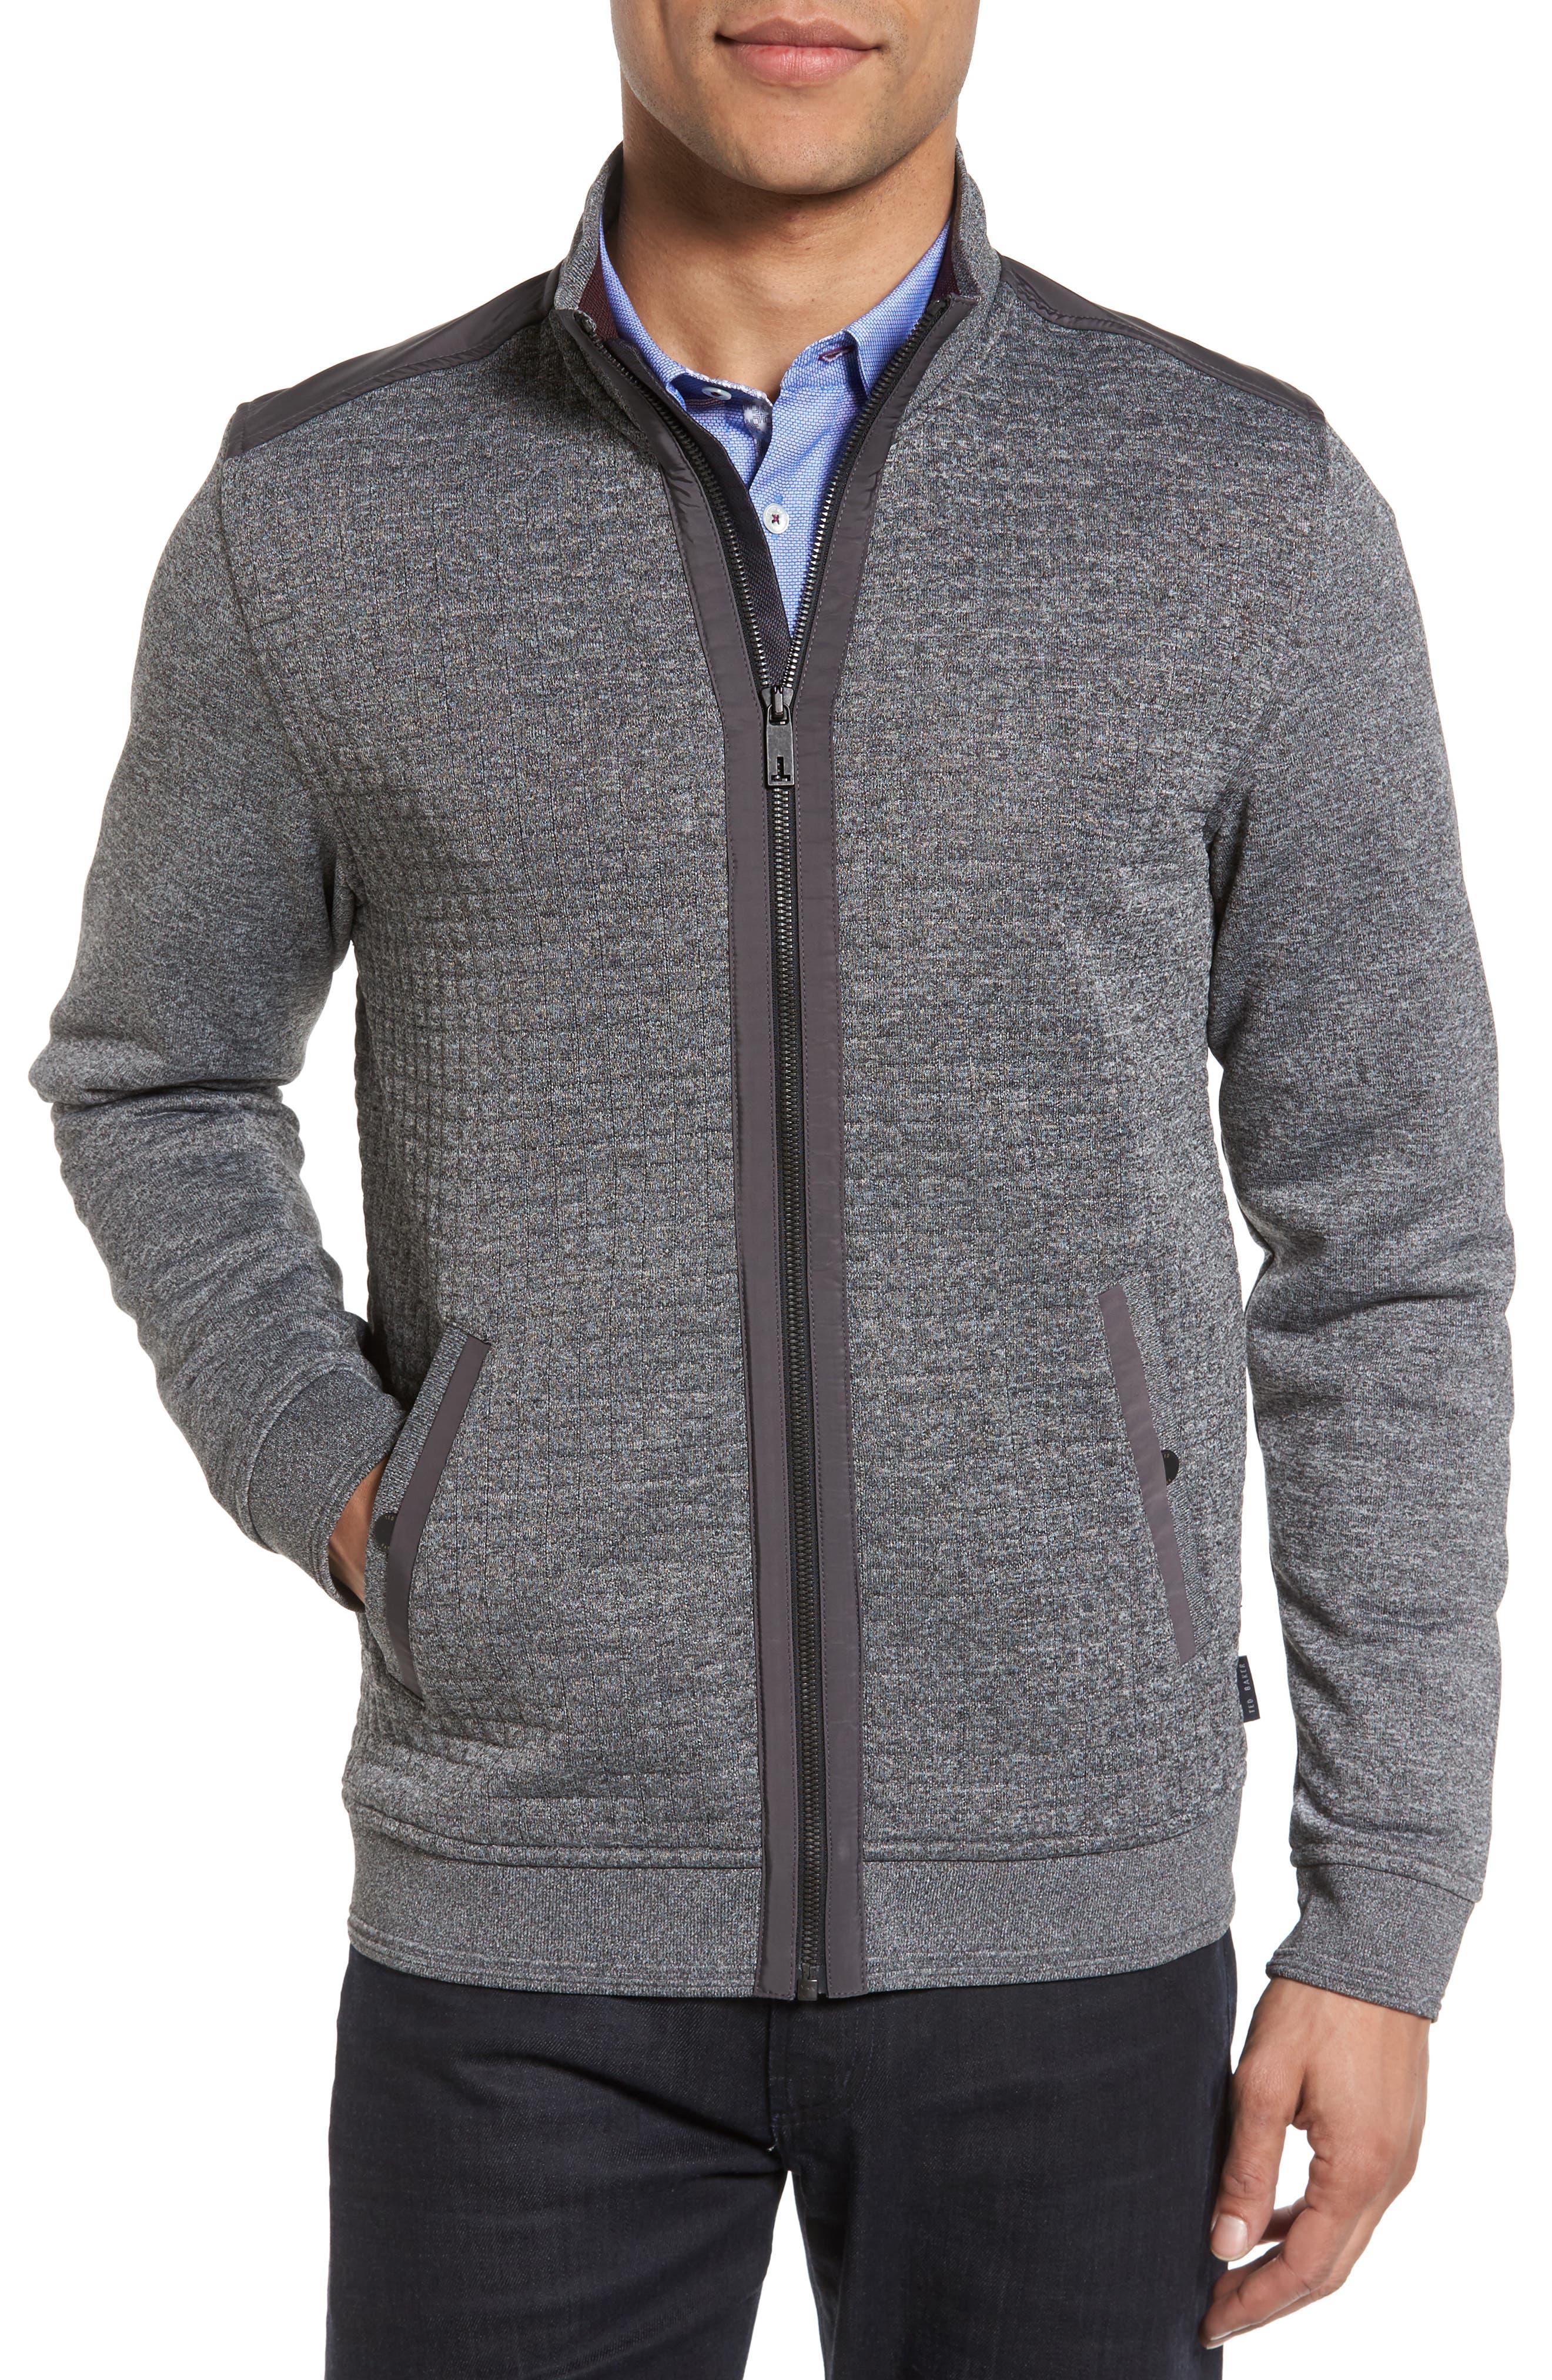 Whooty Full Zip Fleece Jacket,                         Main,                         color, Charcoal